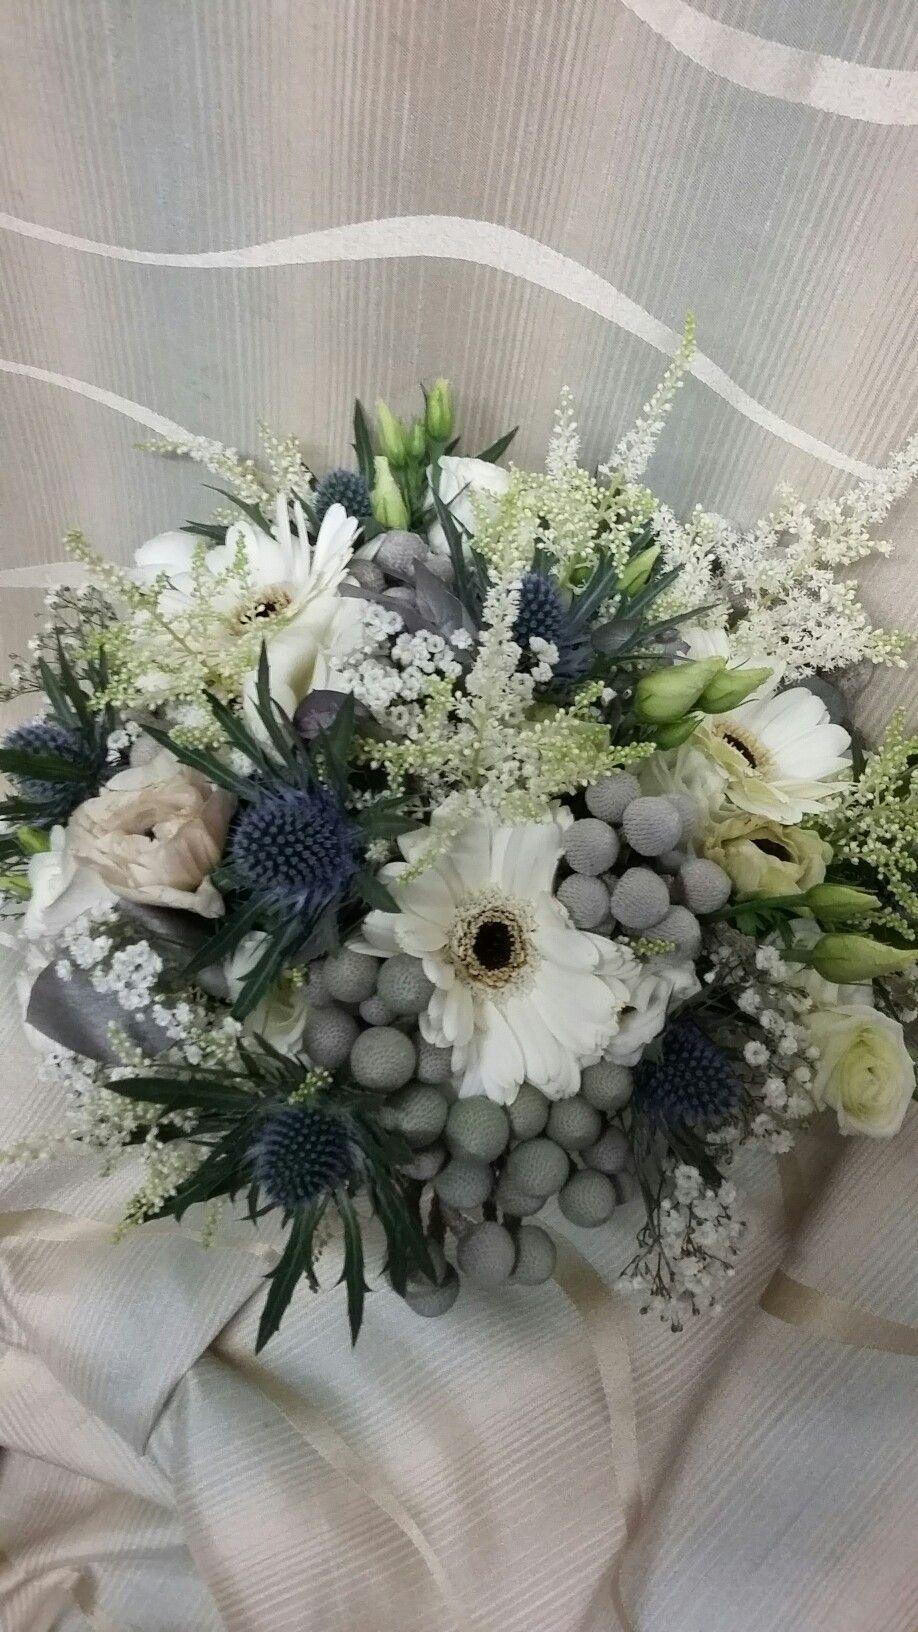 Bridal Bouquets Blossoms Beautiful Simple White Anenomes Germini Brunnia Thistle Astilbe Freesia Perfect